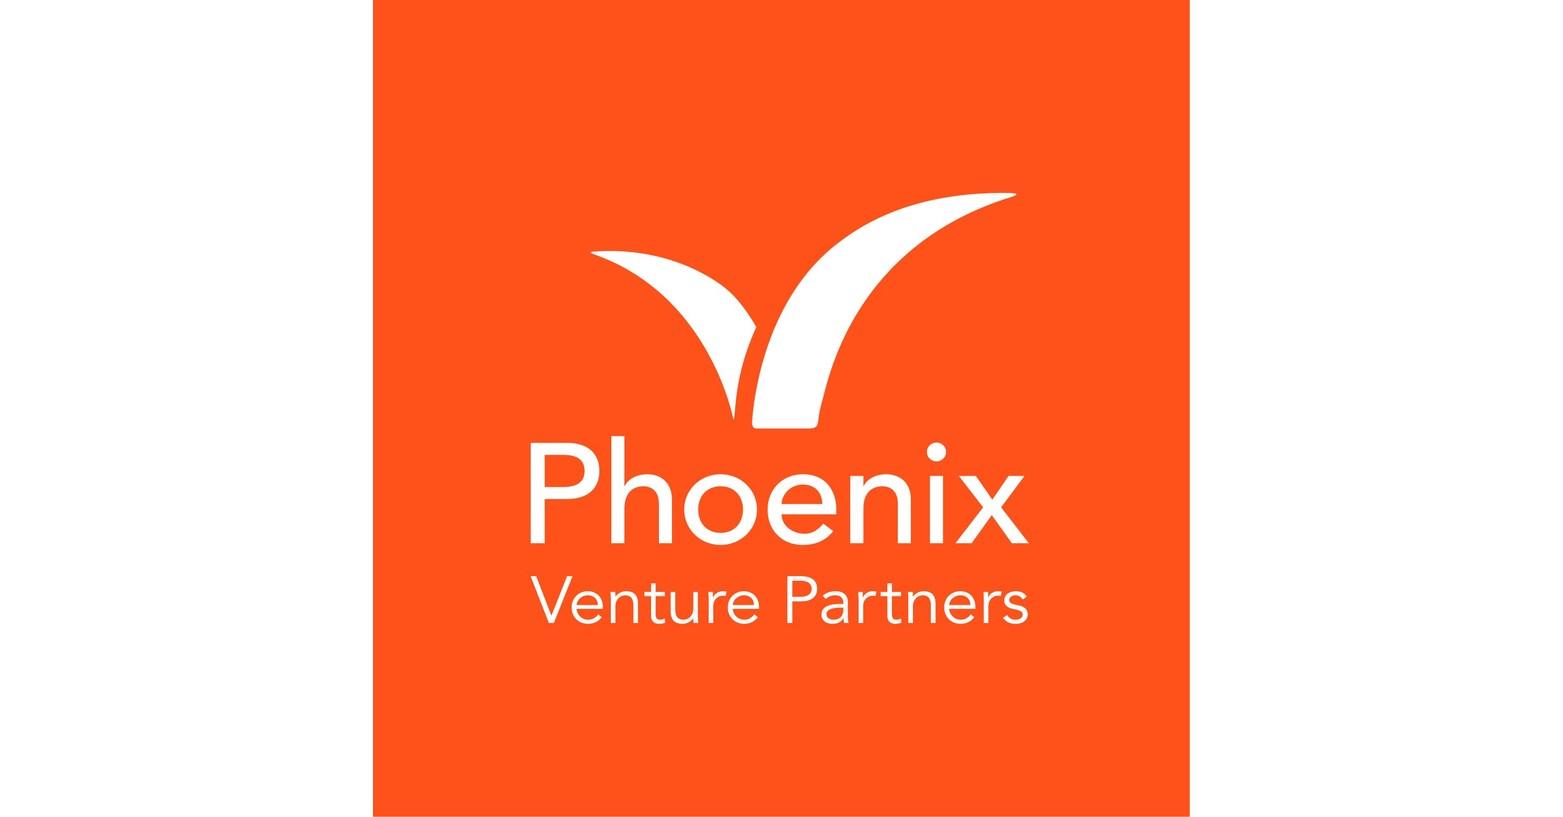 Phoenix Venture Partners Logo jpg?p=facebook.